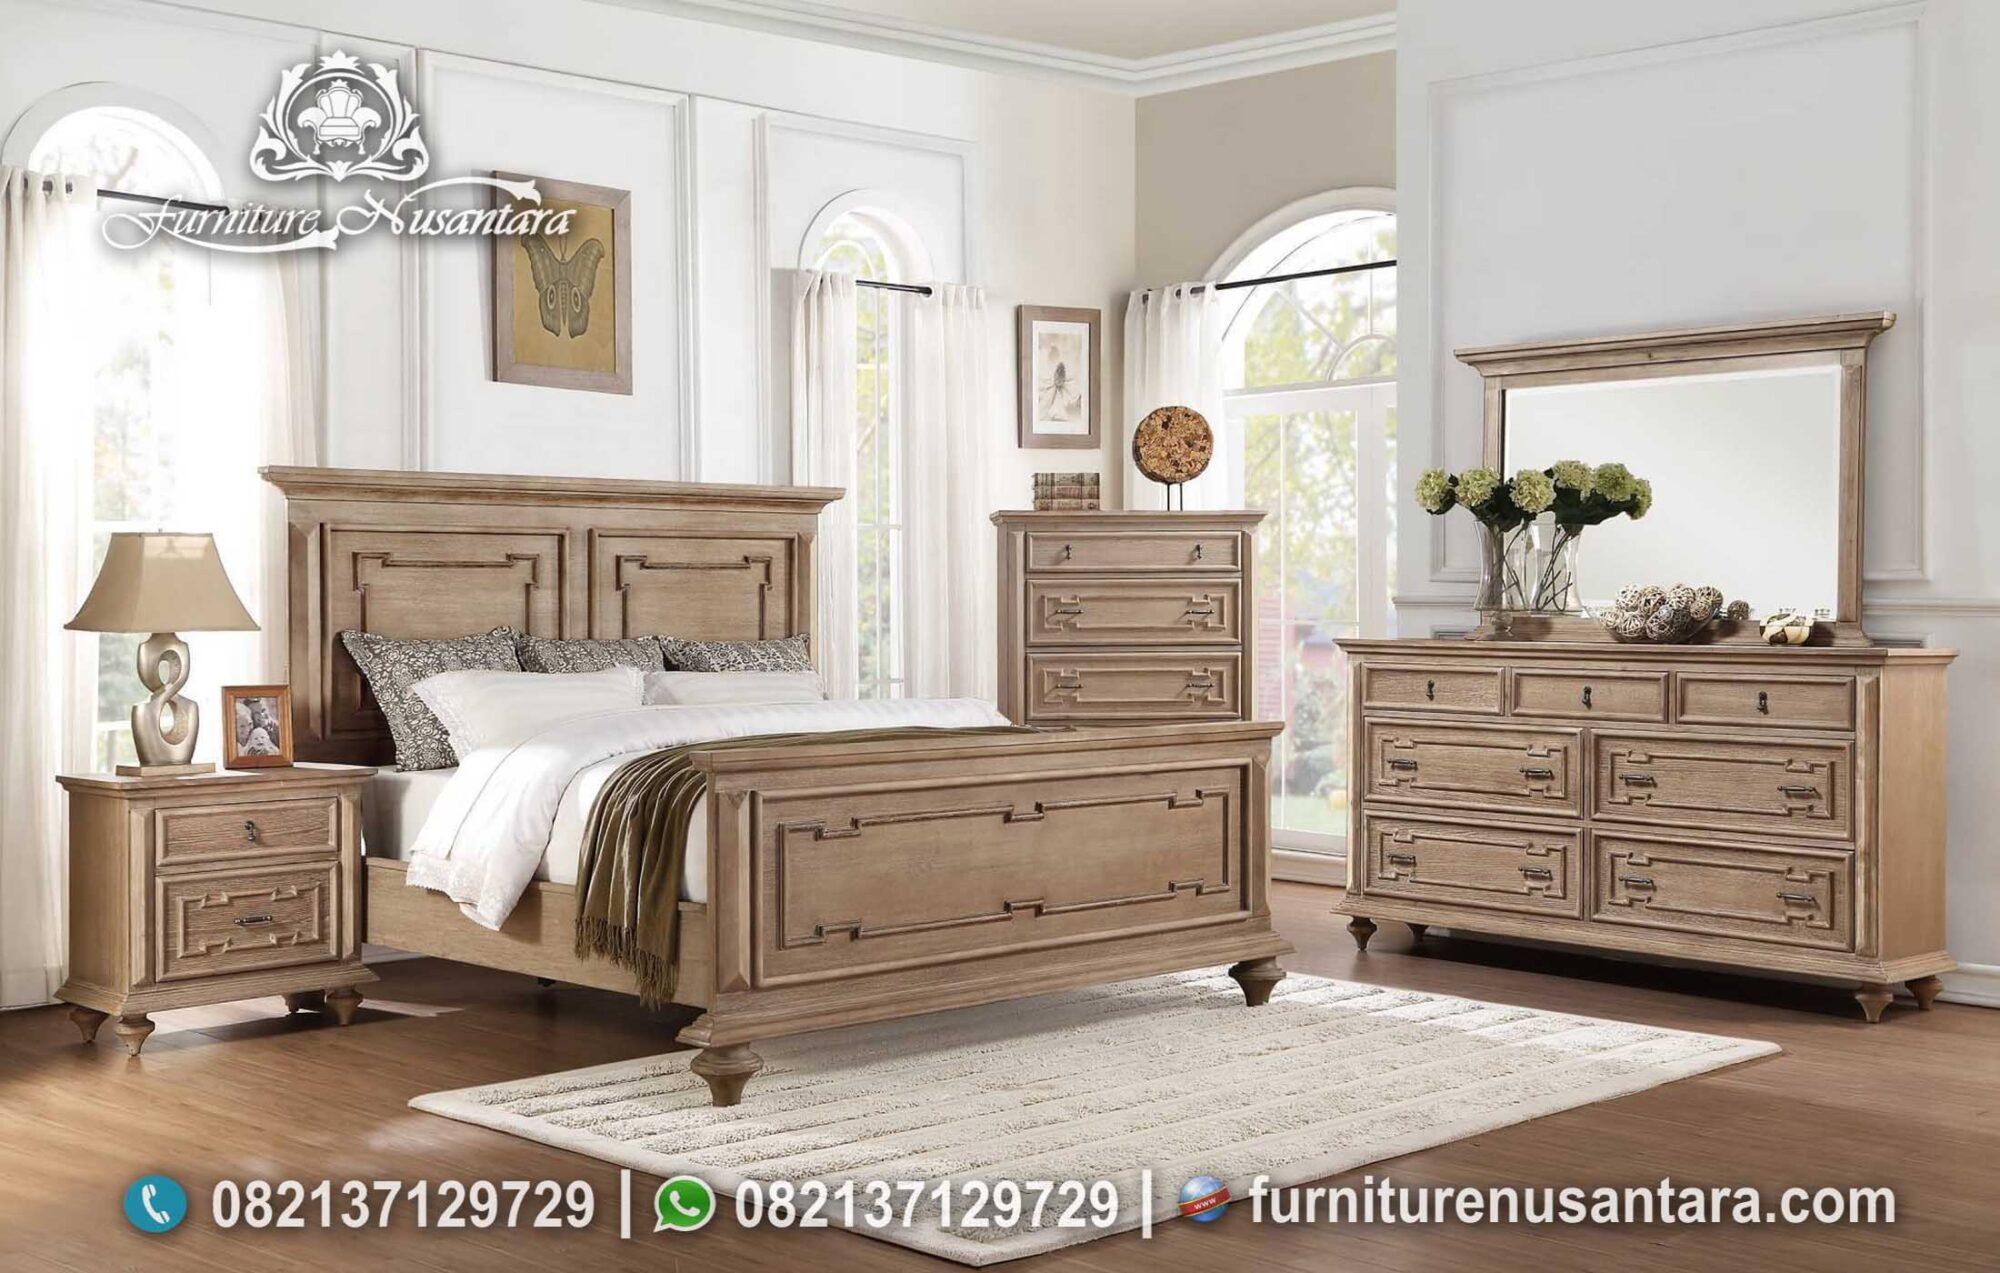 Set Tempat Tidur Model Rustic Finishing KS-153, Furniture Nusantara